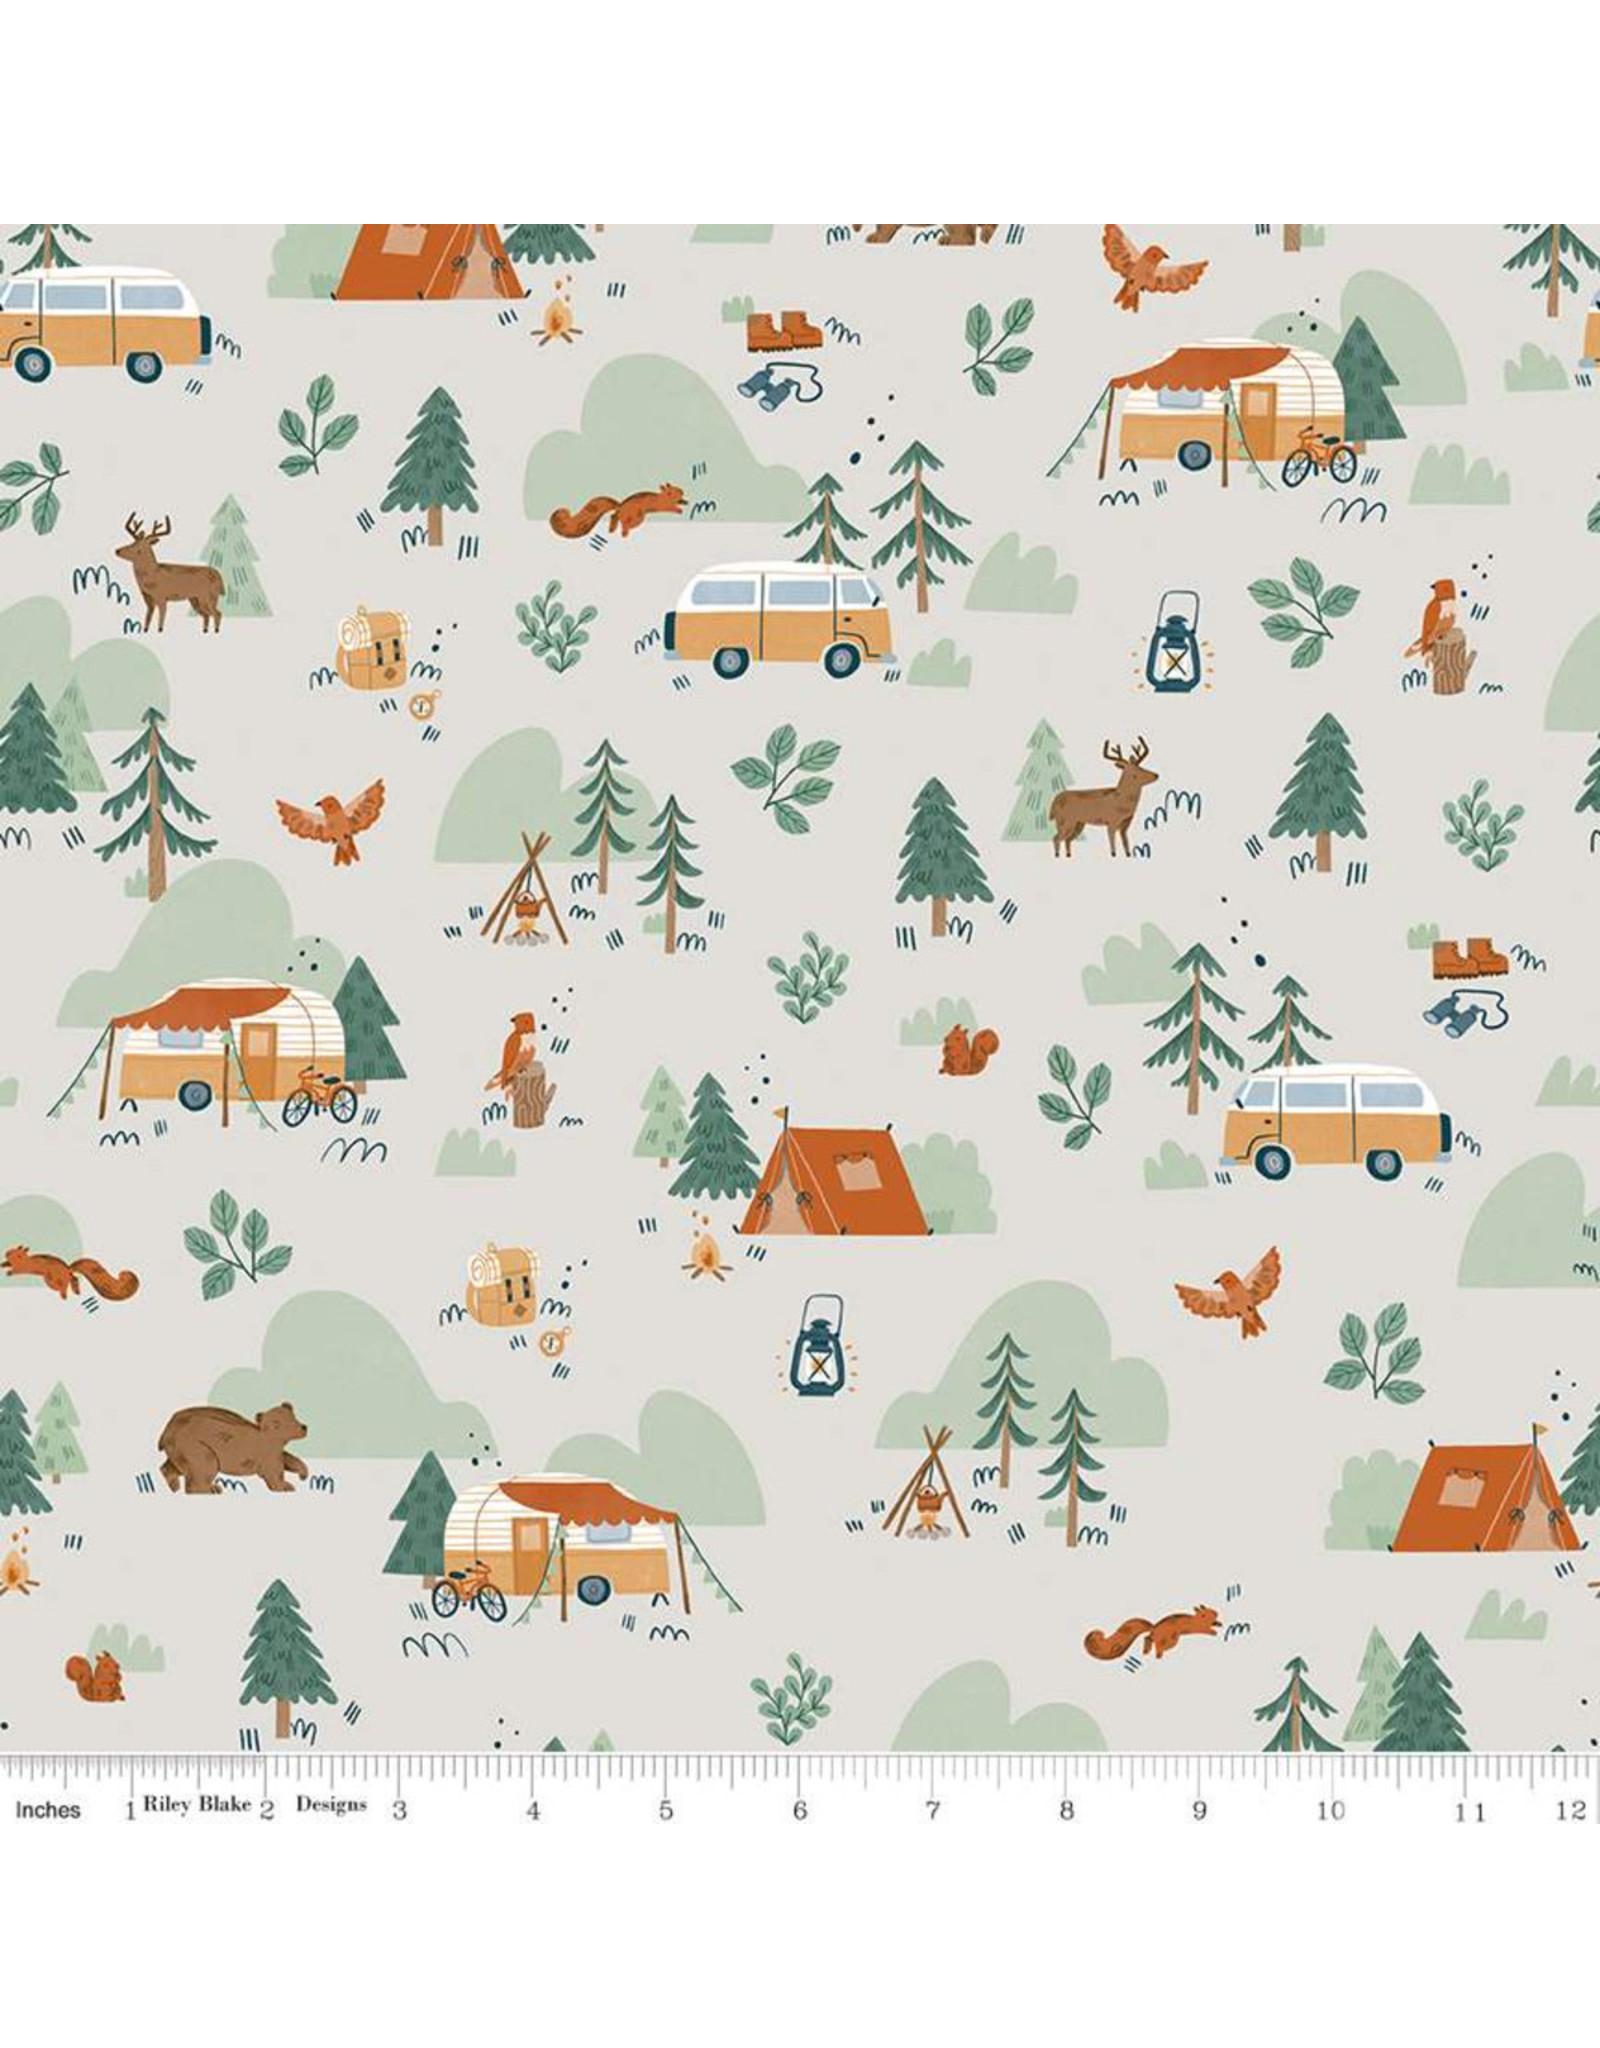 Riley Blake Fabrics Camp Woodland, Camping in Off White, Fabric Half-Yards